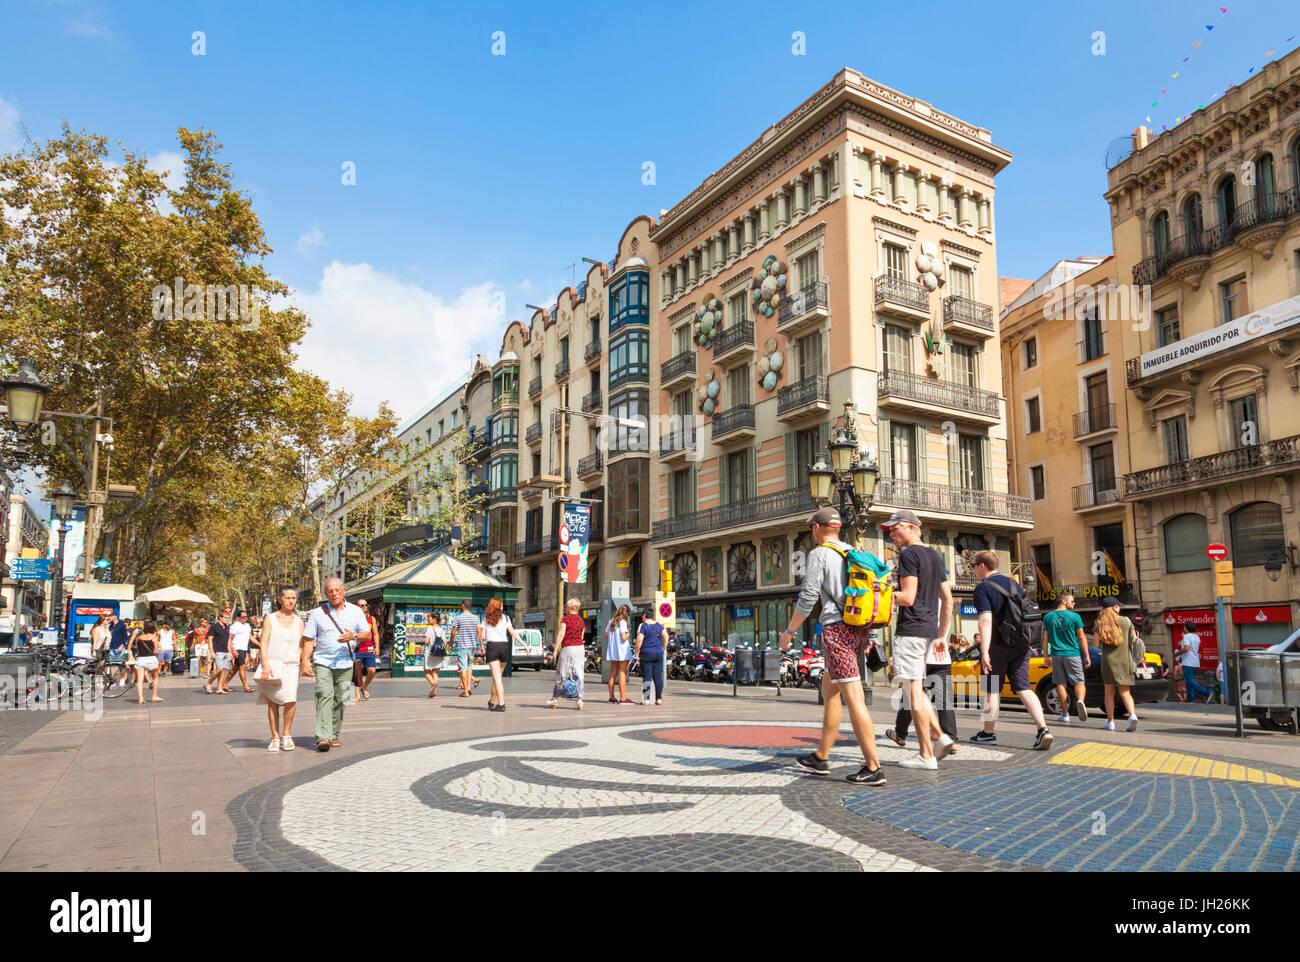 Das Barcelona Miro Mosaik auf dem Boulevard La Rambla (Las Ramblas), die Promenade durch Barcelona, Katalonien (Catalunya), Stockbild